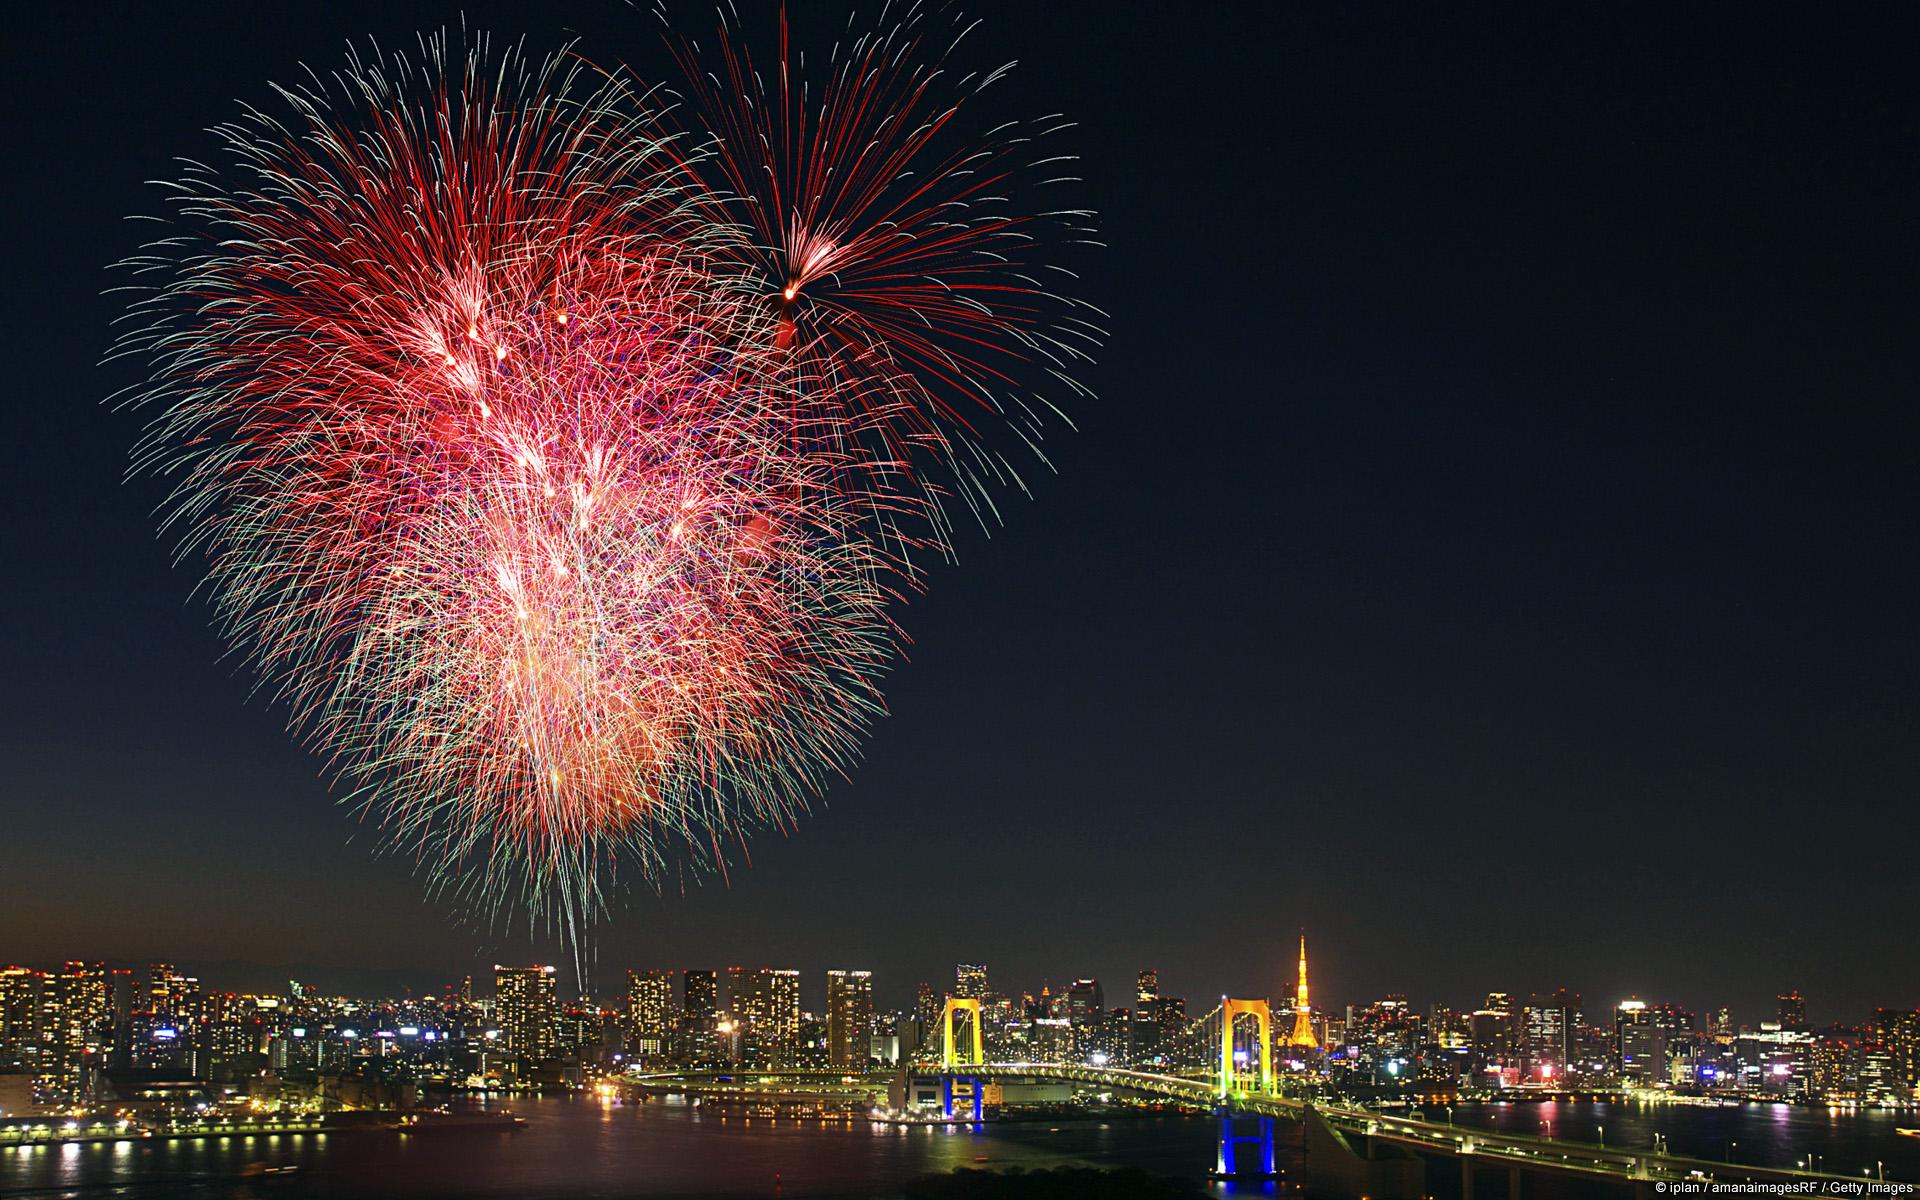 Fireworks HD Wallpaper  Background Image  1920x1200  ID:459692